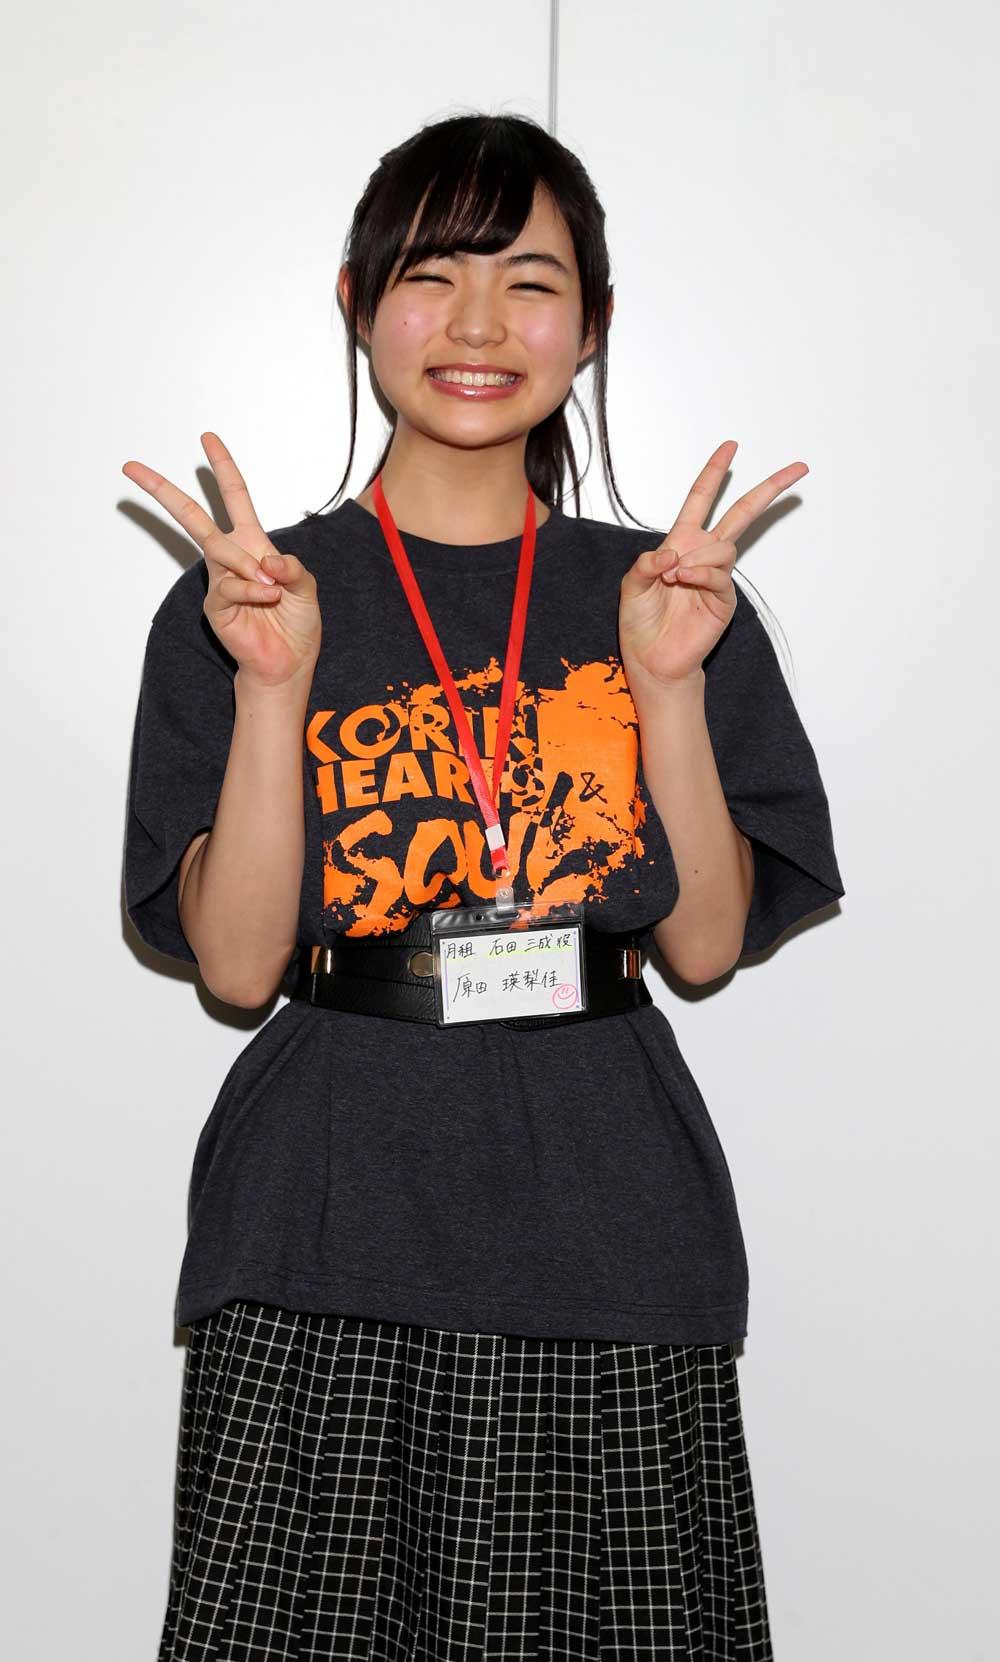 Images : 5番目の画像 - 「中島明子、原田瑛梨佳/舞台に咲く、可憐な二輪、アリスインプロジェクトの最新舞台「降臨Hearts&Soul」で満開に!」のアルバム - Stereo Sound ONLINE